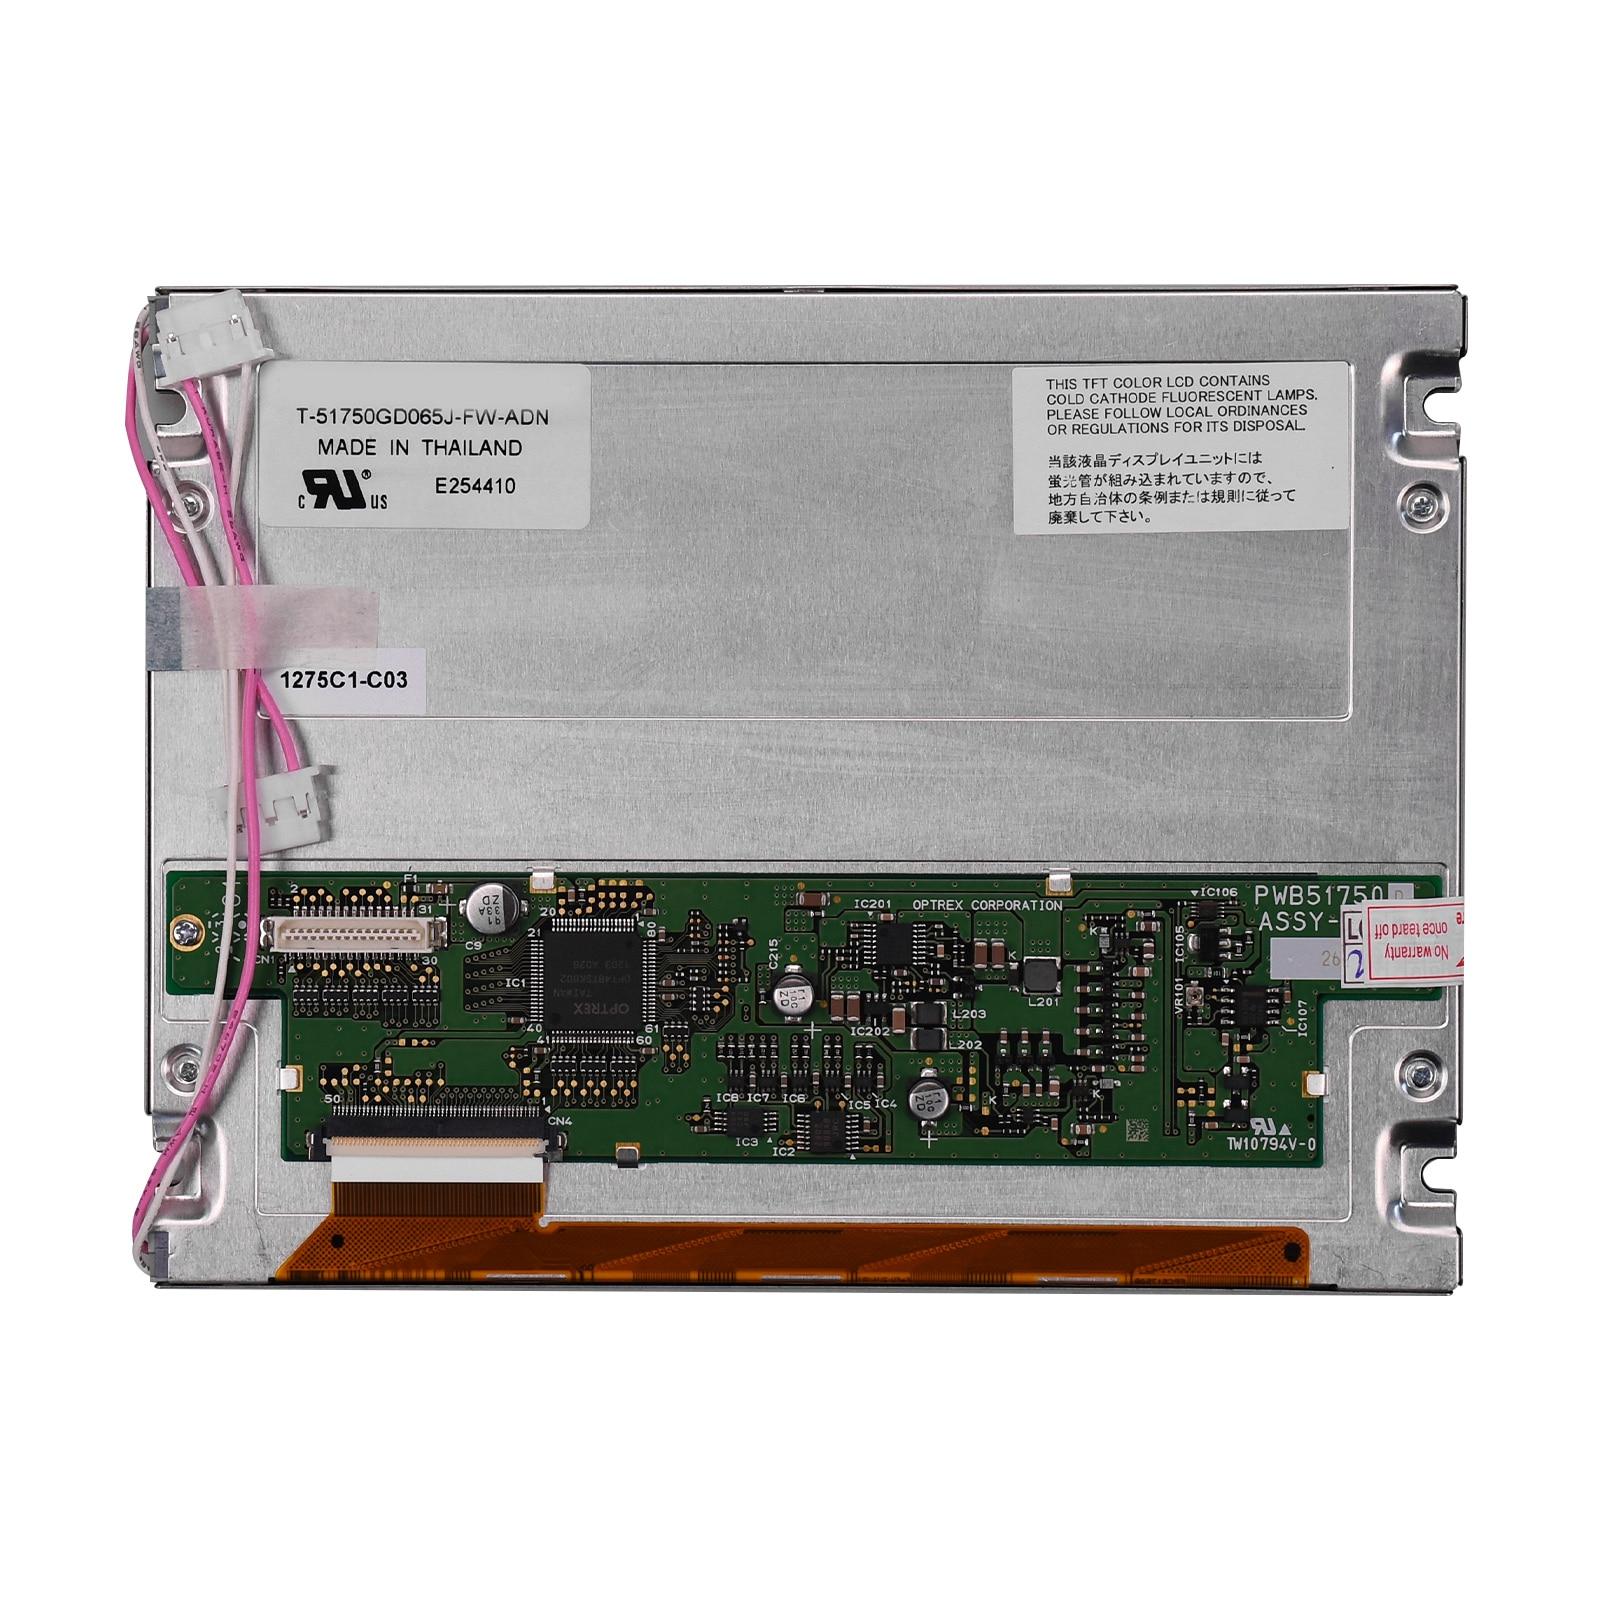 Nueva pantalla LCD de 6,5 pulgadas para OPTREX 640*480 T-51750AA reemplazo de Monitor digitalizador de T-51750GD065J-FW-ADN